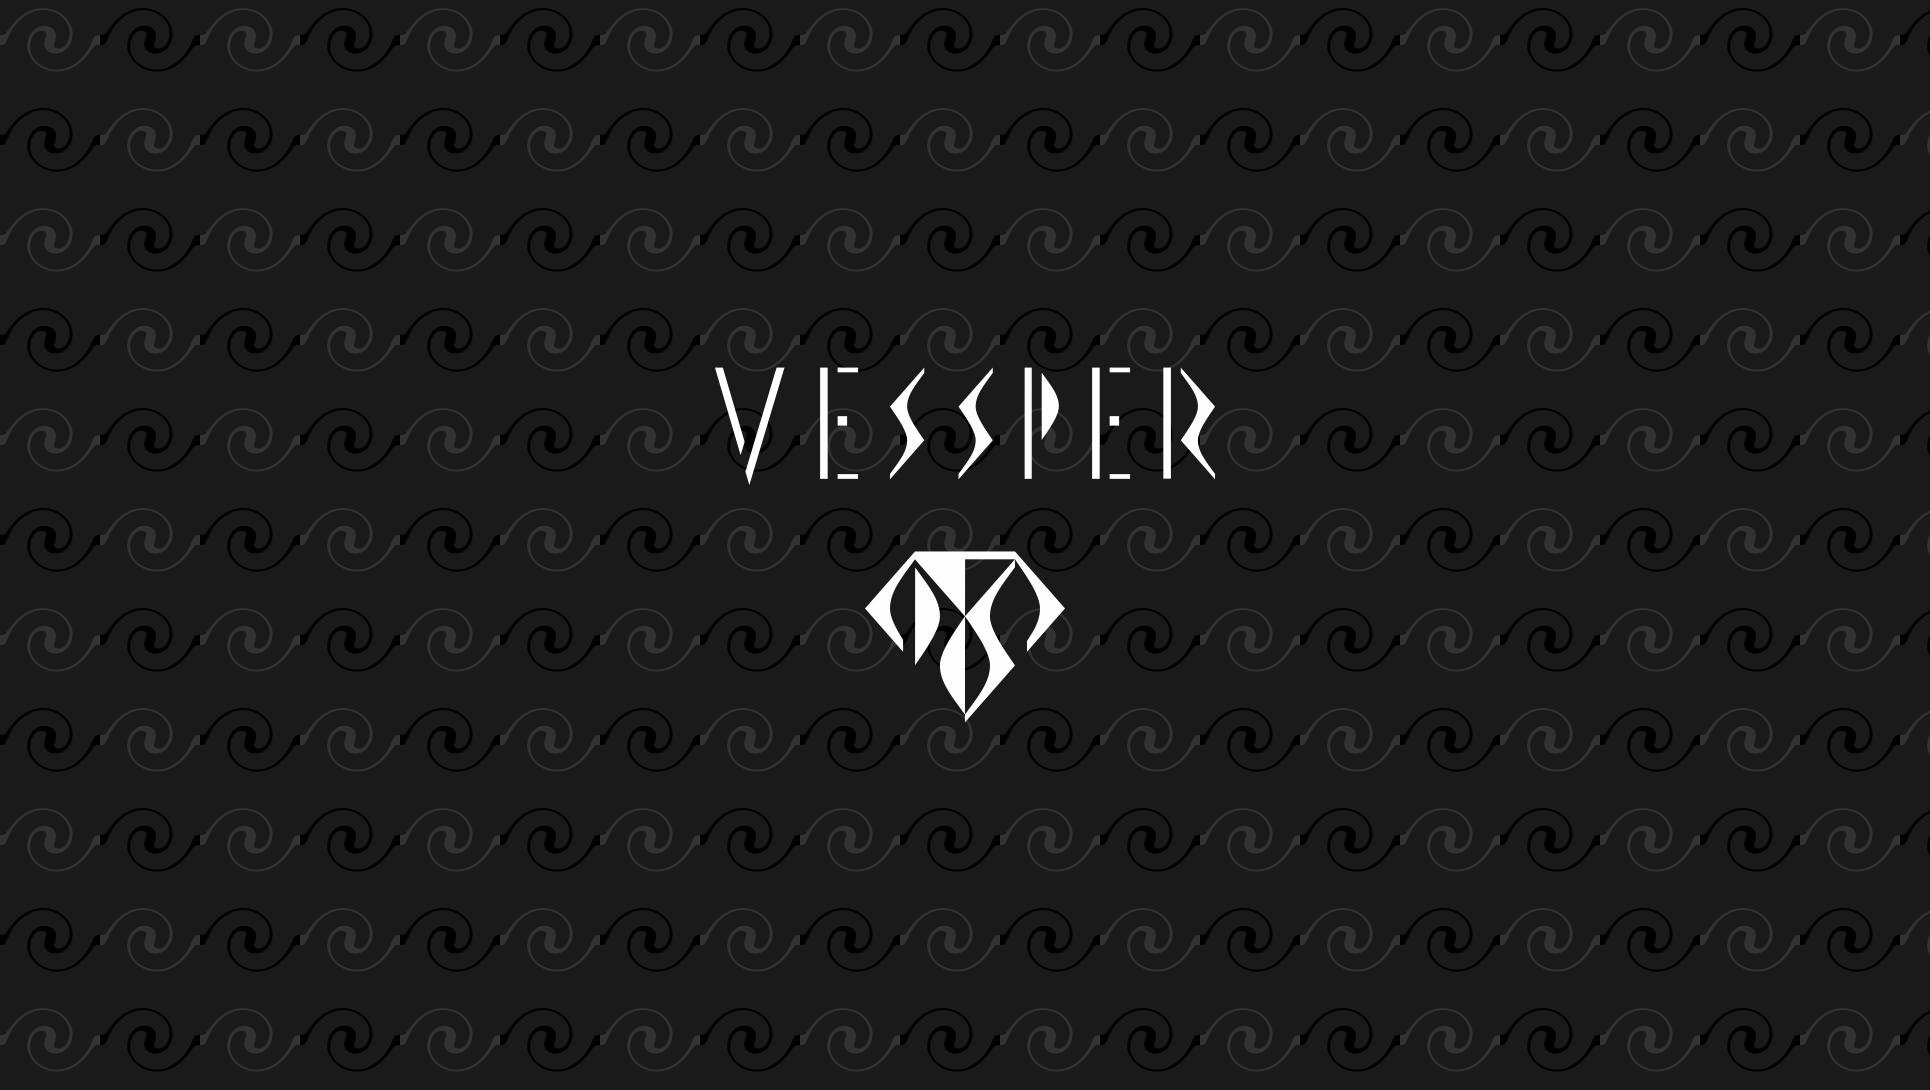 VESSPER